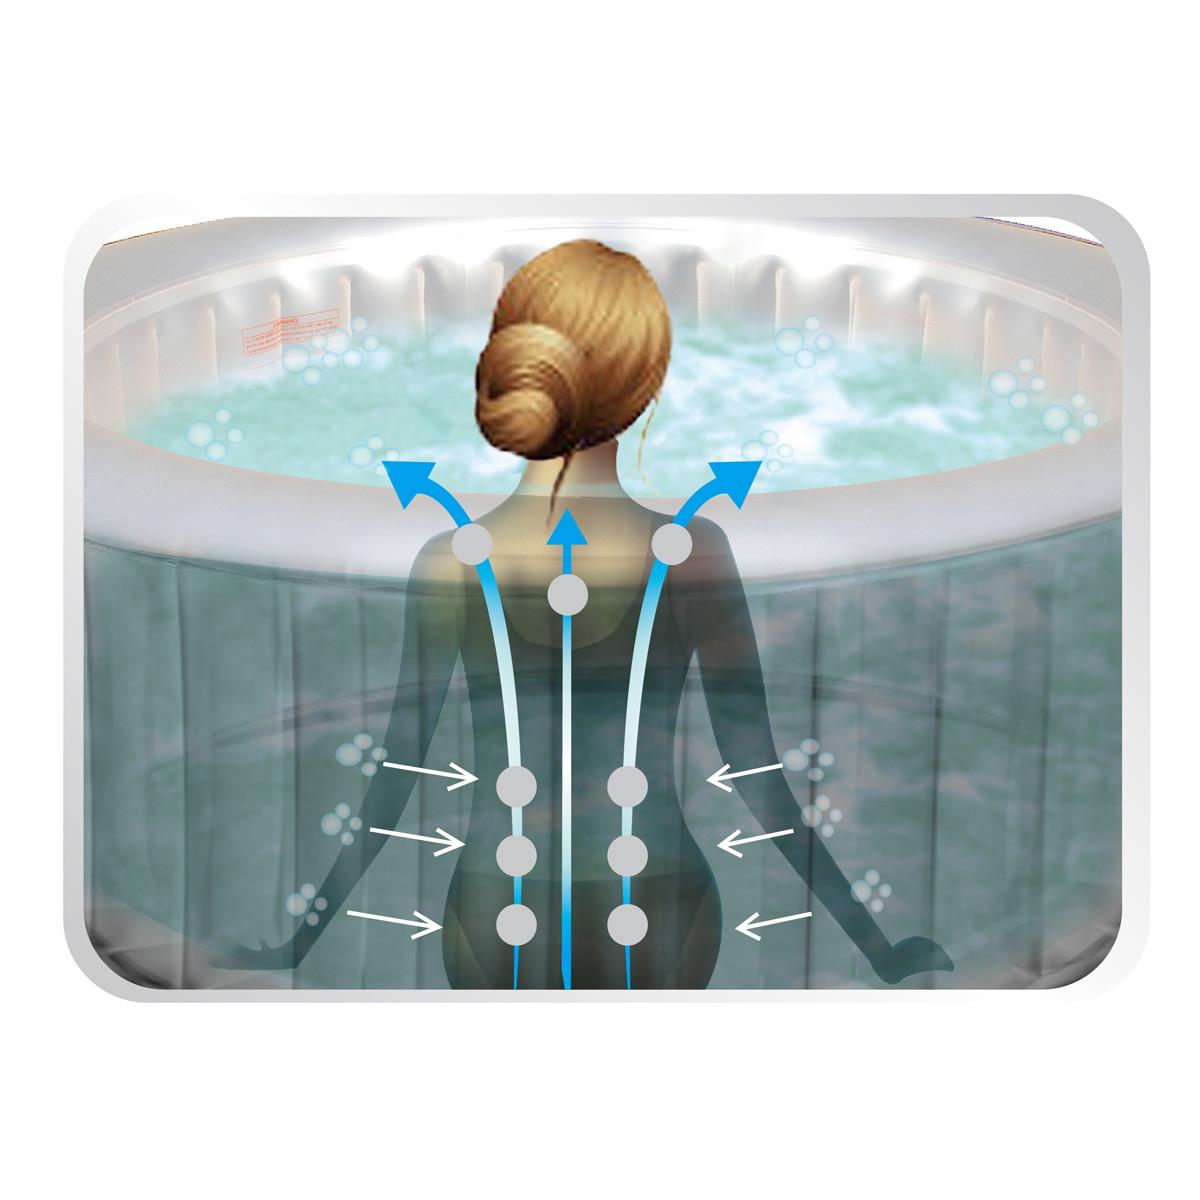 Jacuzzi jardín 158 cm piscina inflable por 499,99€